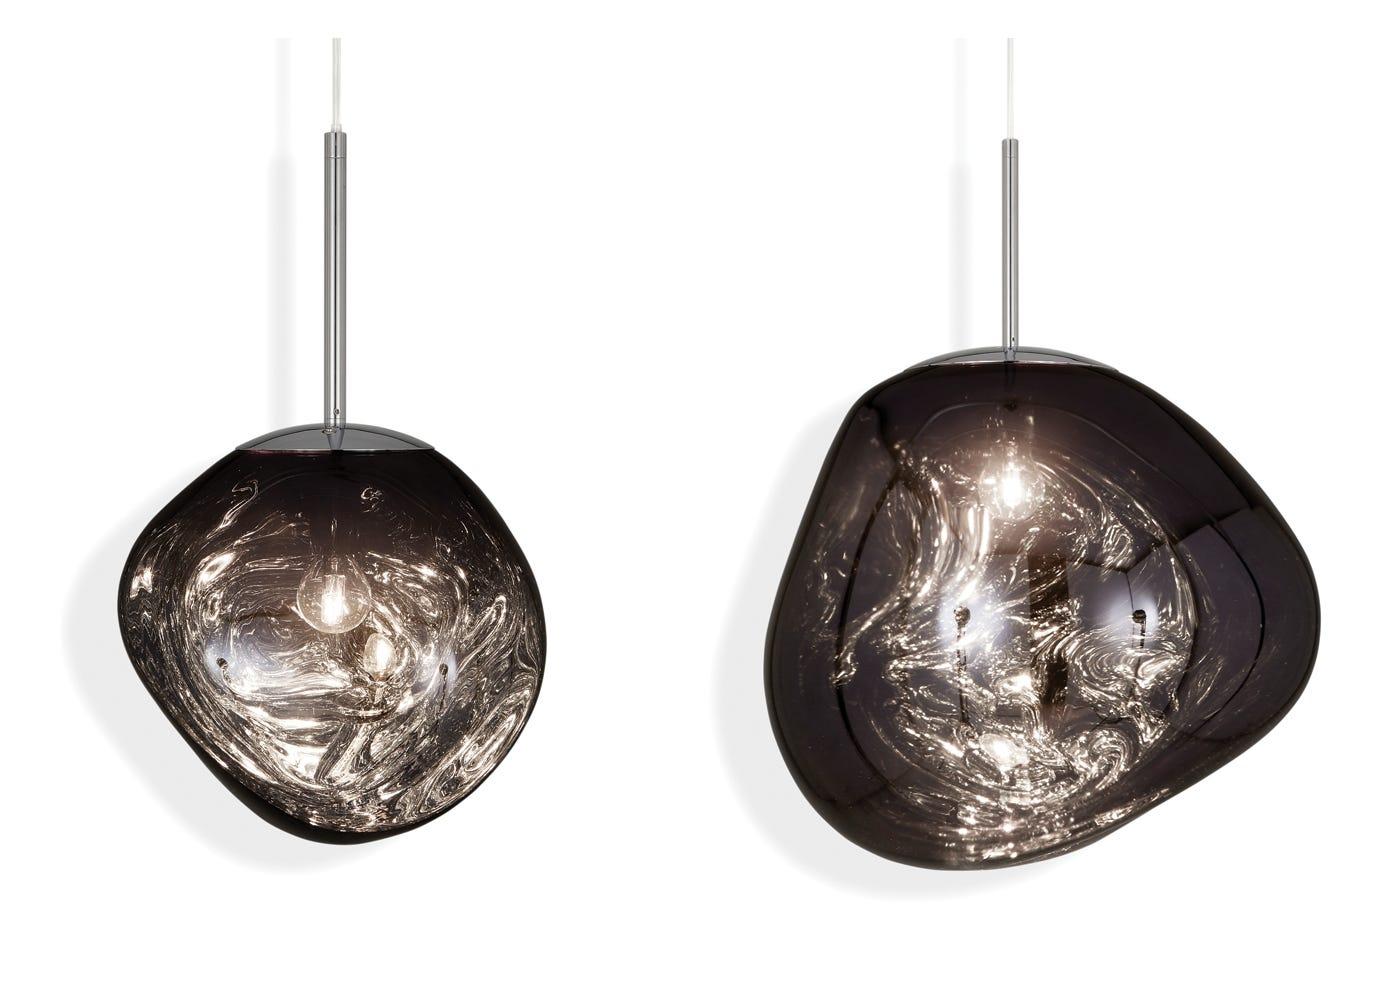 From left to right: Smoke mini light on, Smoke standard light on